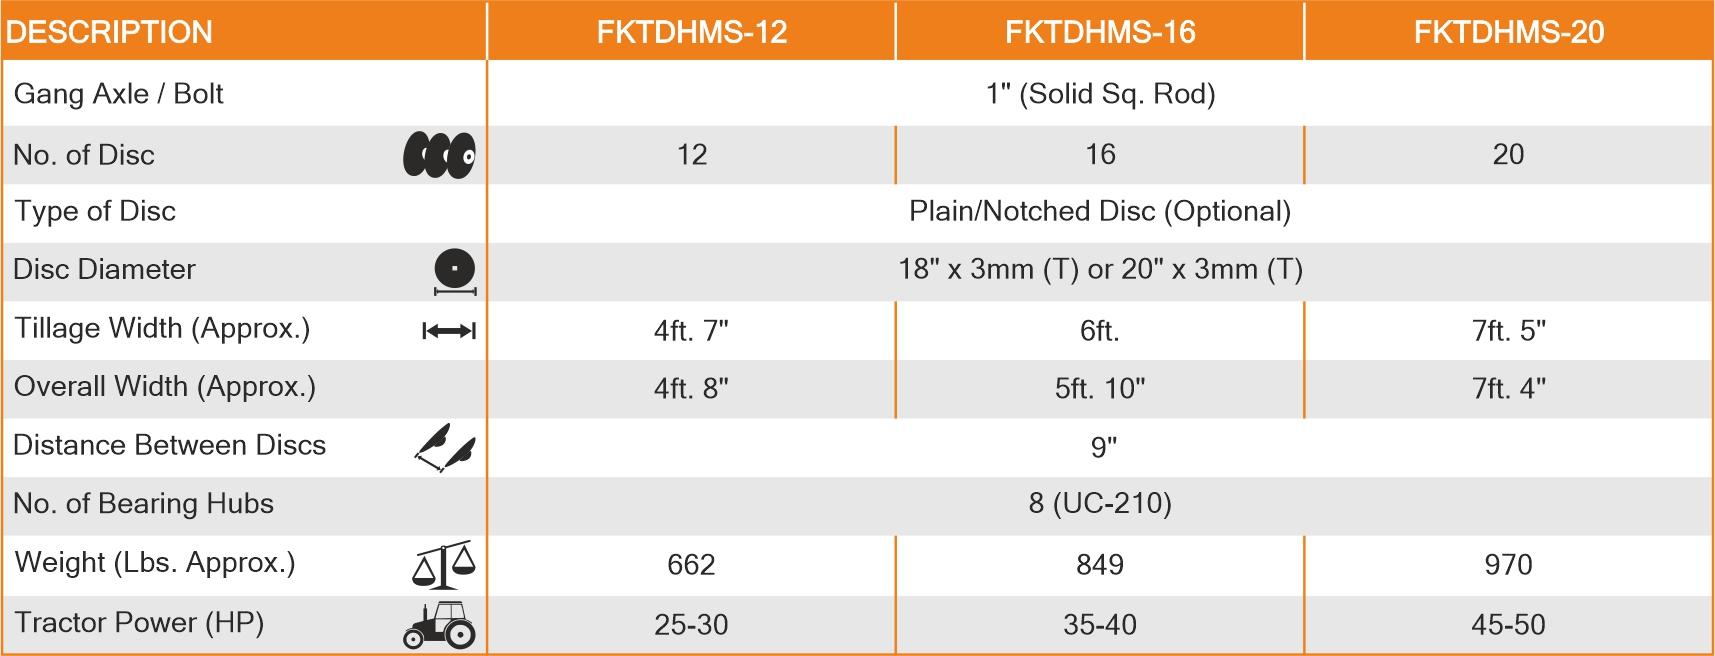 Tandem Disc Harrow Medium Series Spectifications